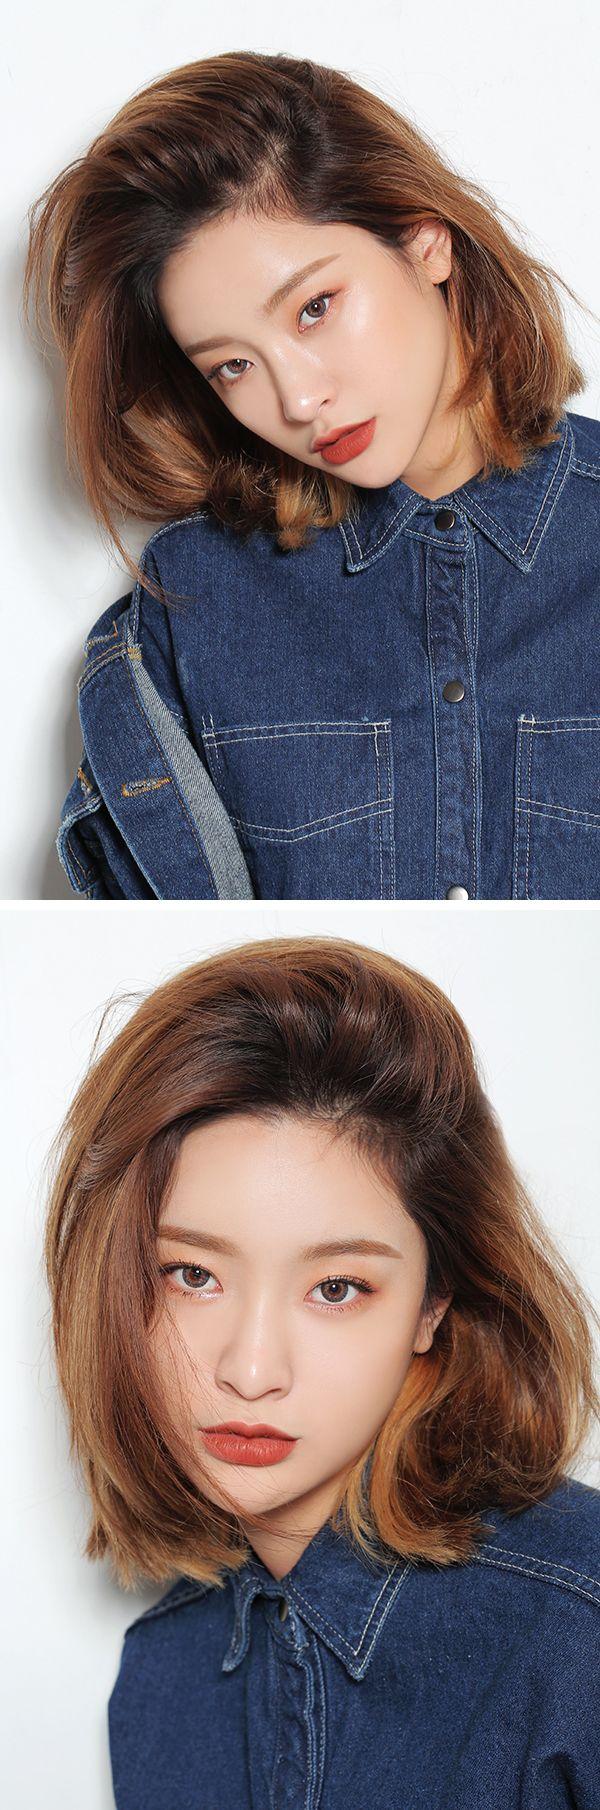 10 Stylish Messy Hair Up Do Hairstreet Stylelove It 3